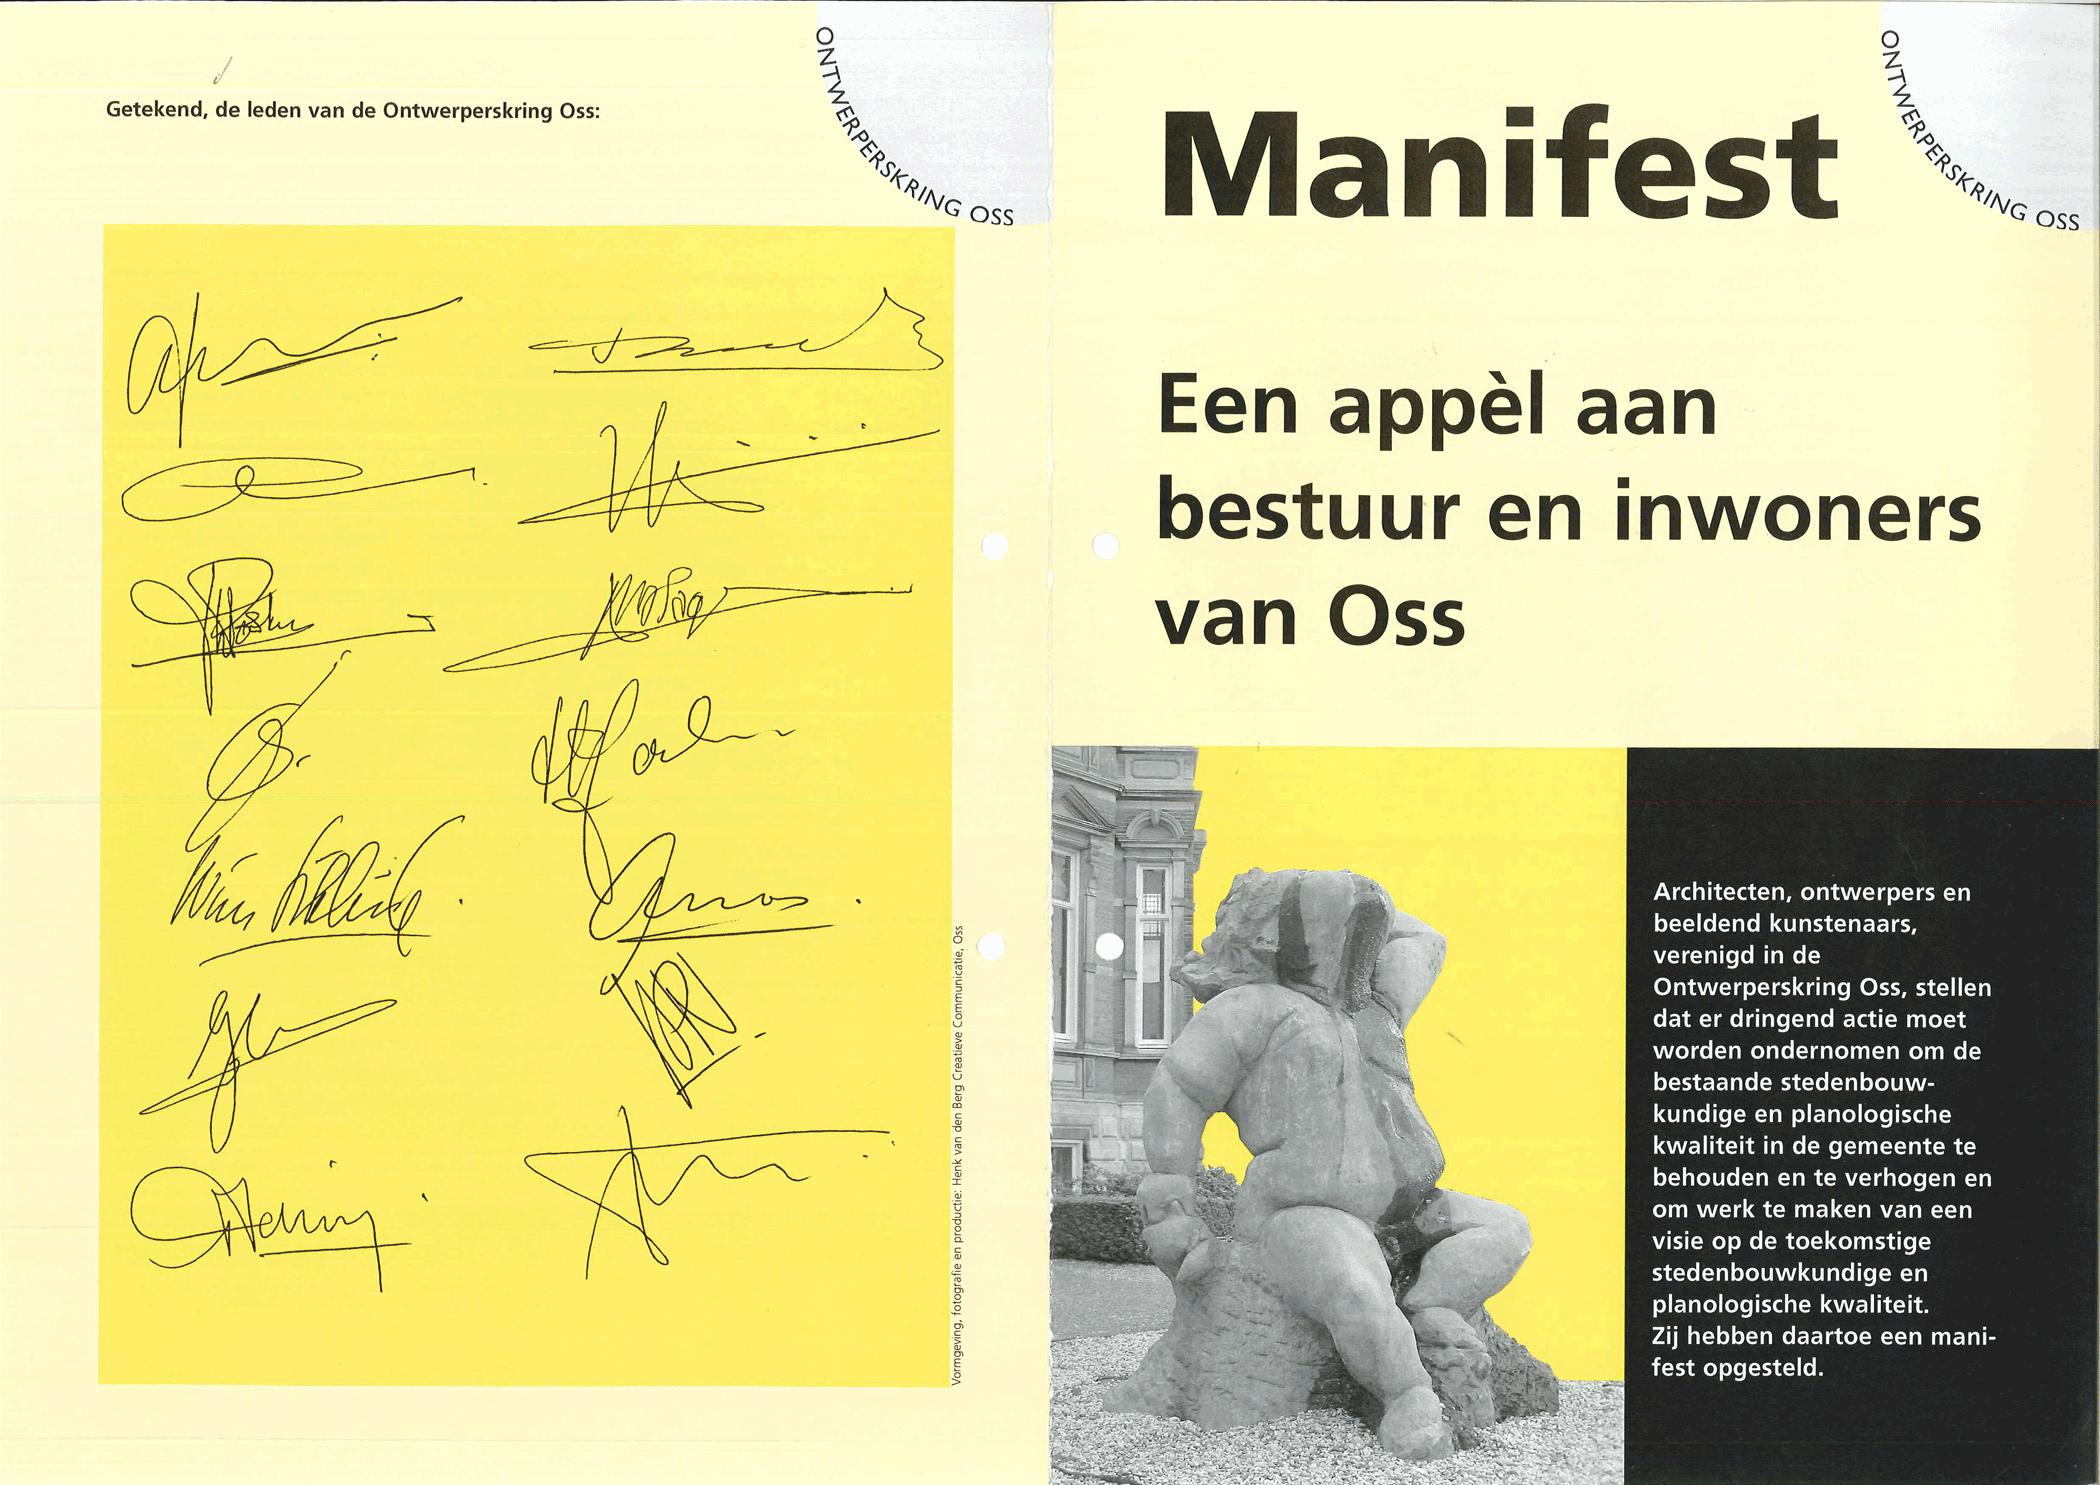 Manifest 2002 OntwerpersKring Oss